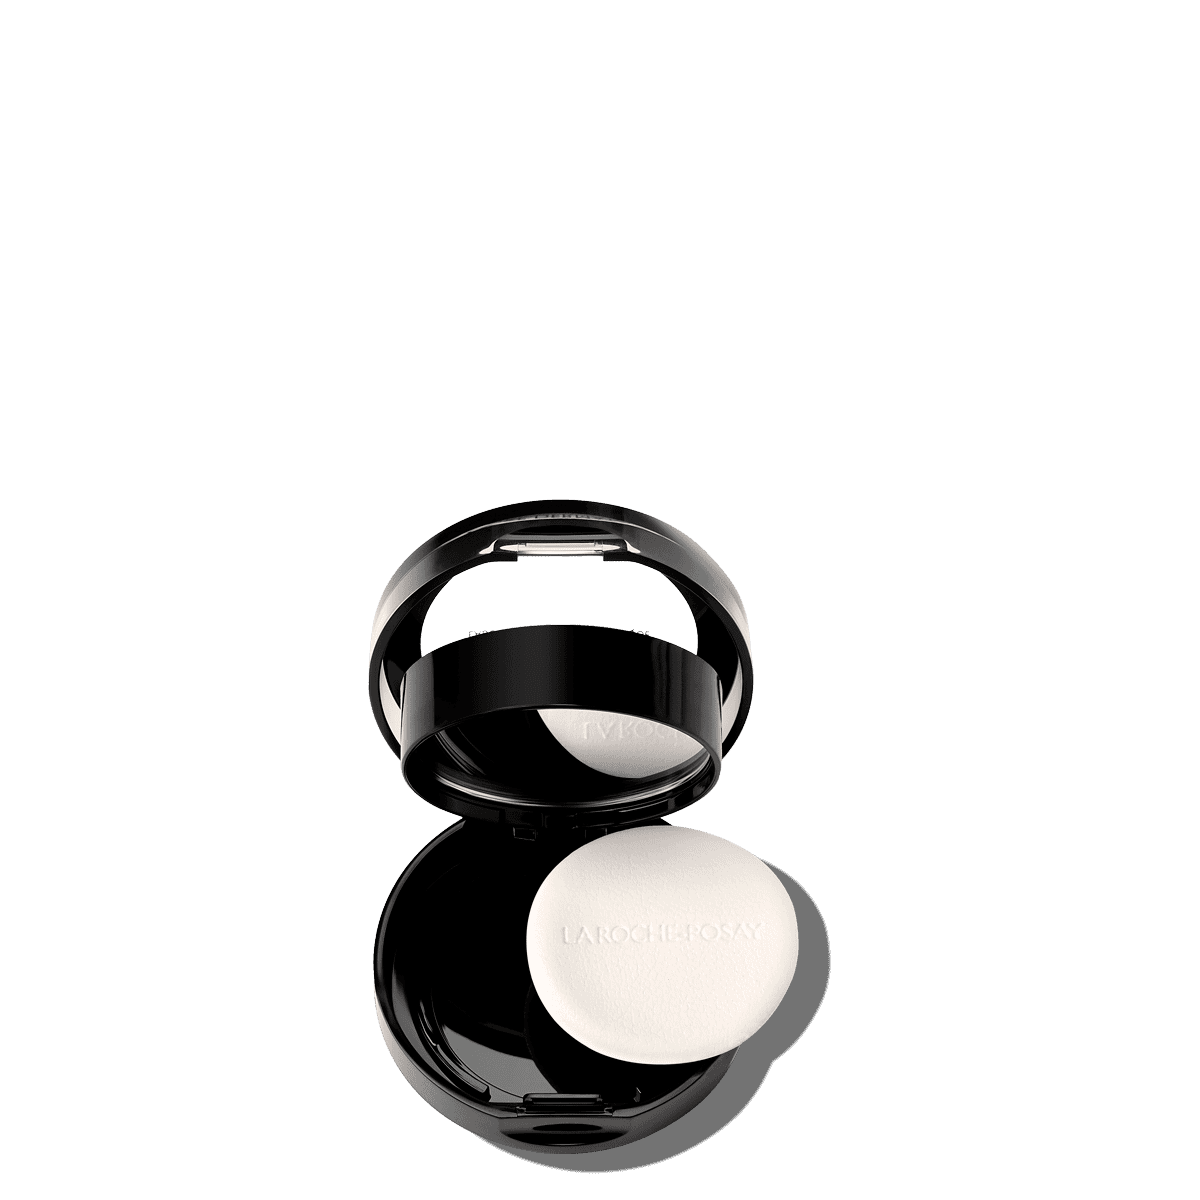 La Roche Posay Herkkä Toleriane Make up BLUSH GoldenPink 30102415 O